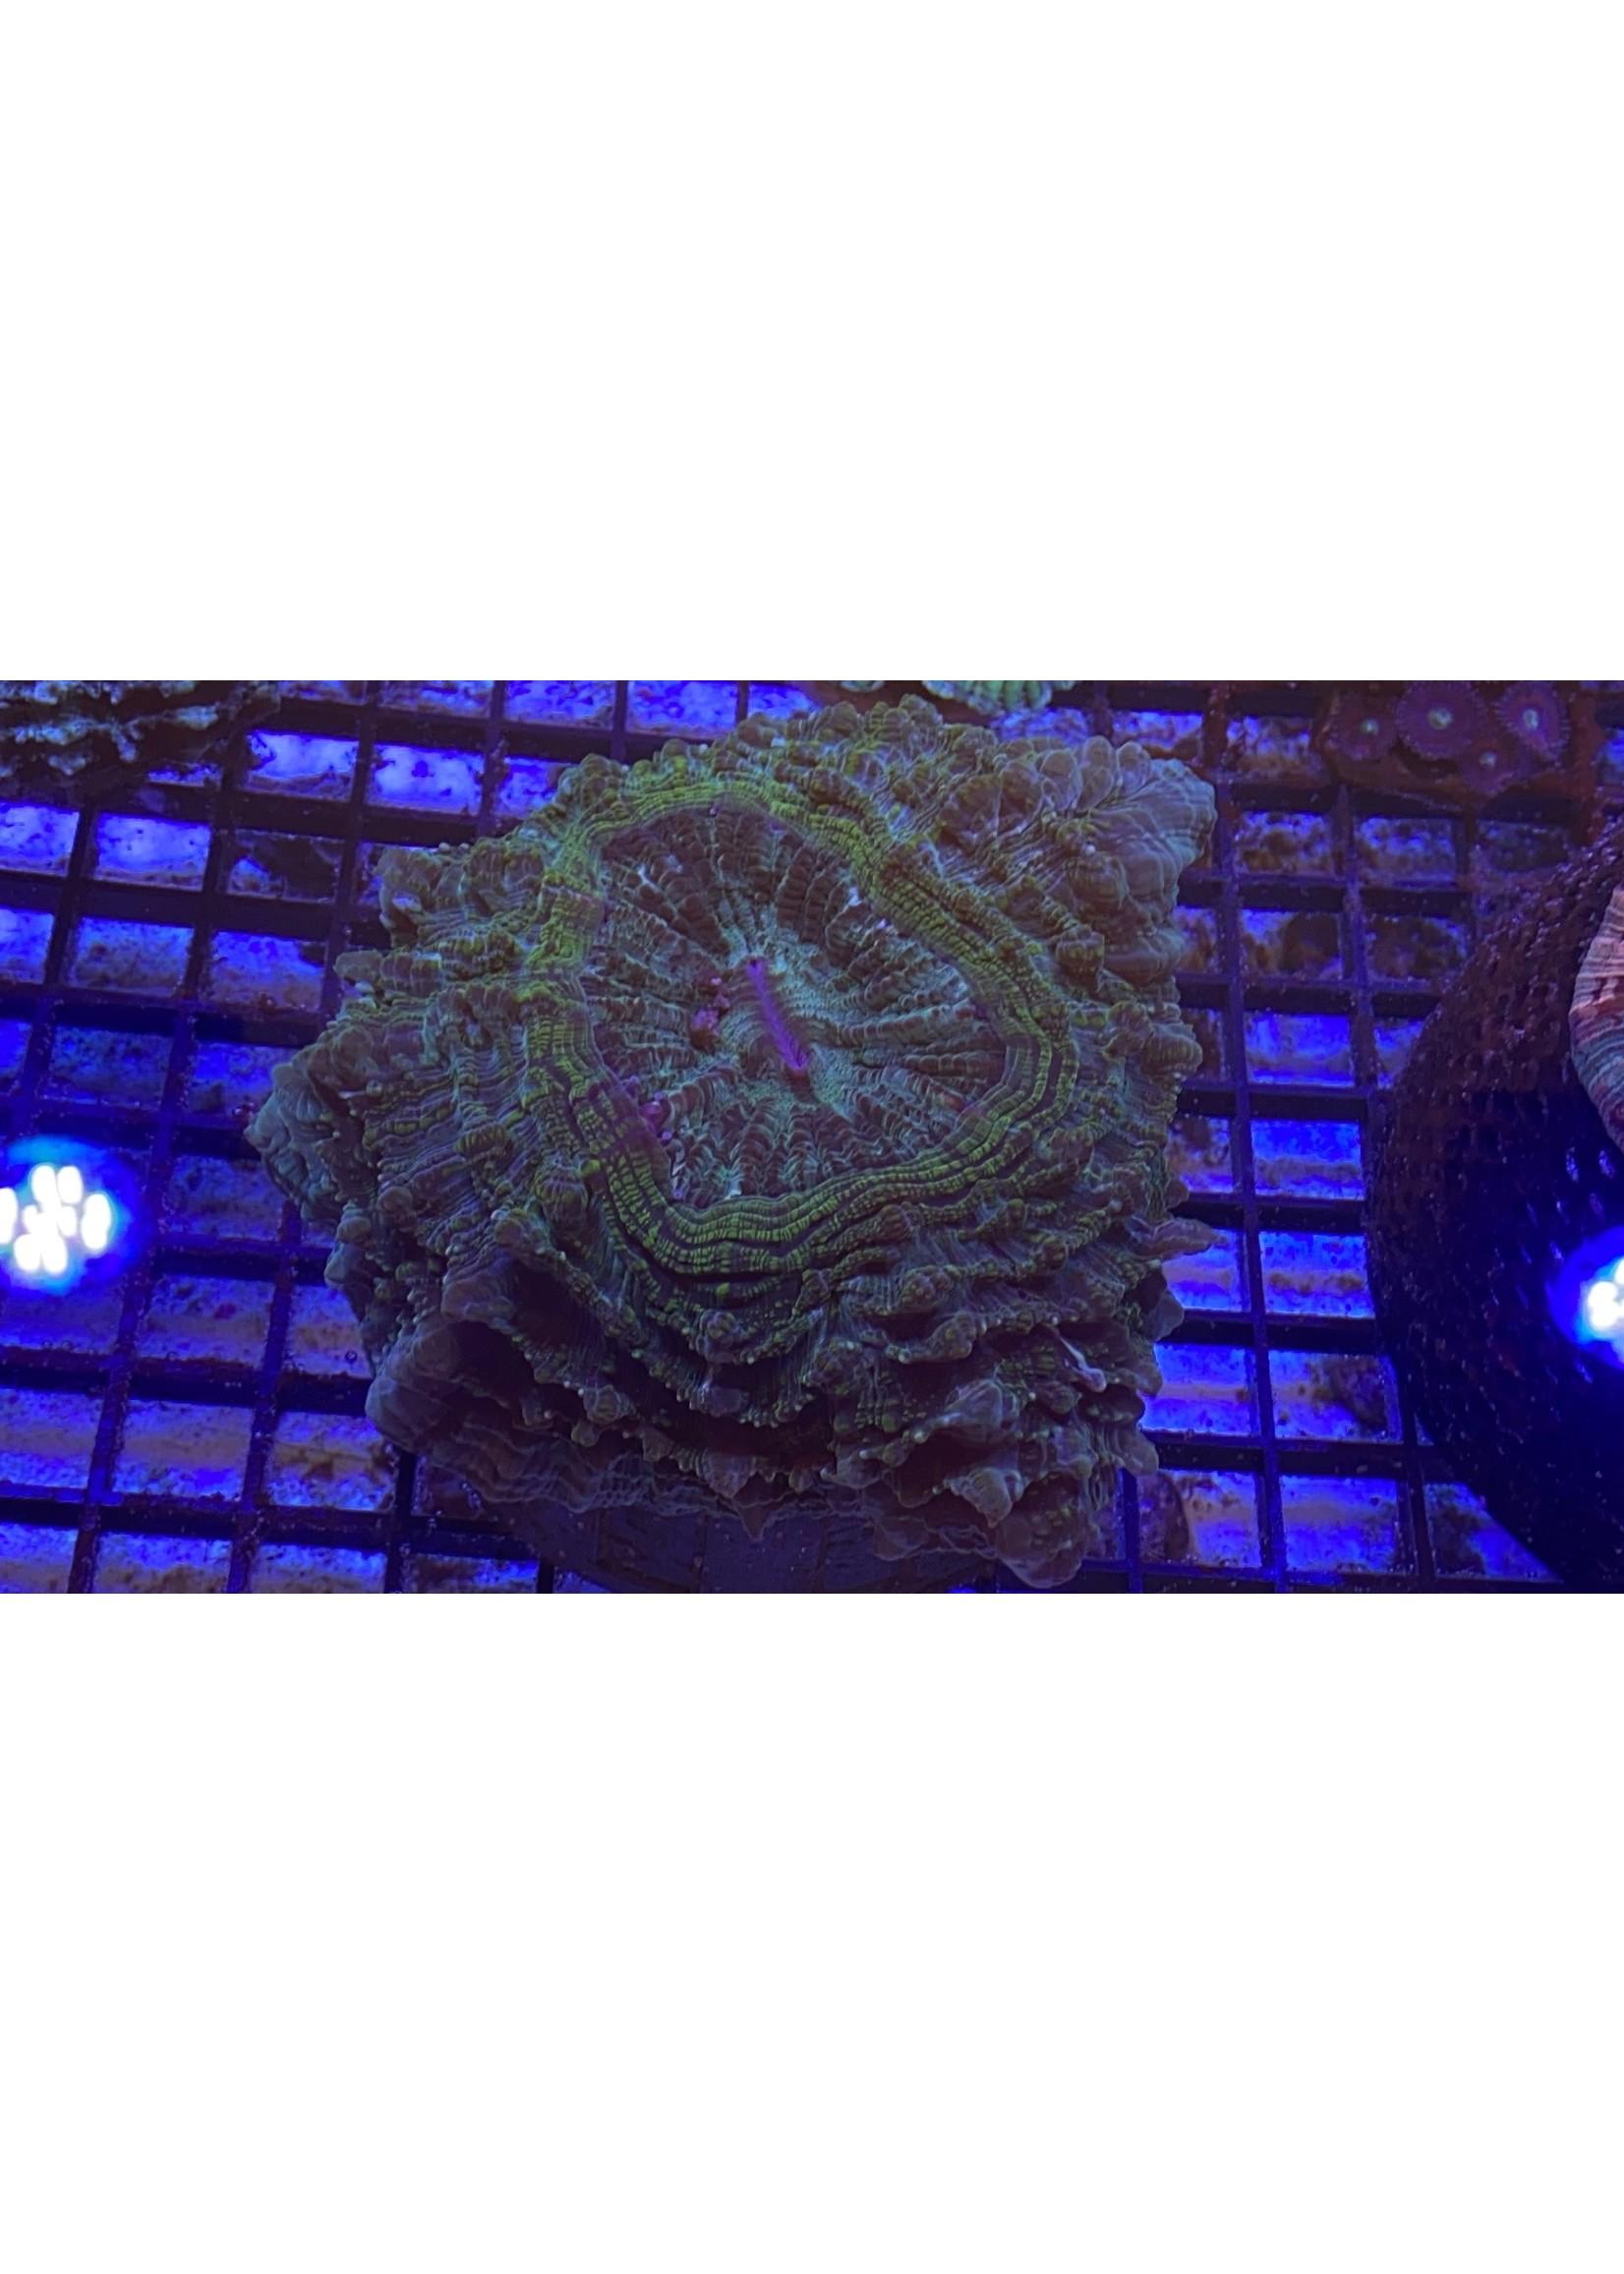 XL Australian Meat Coral